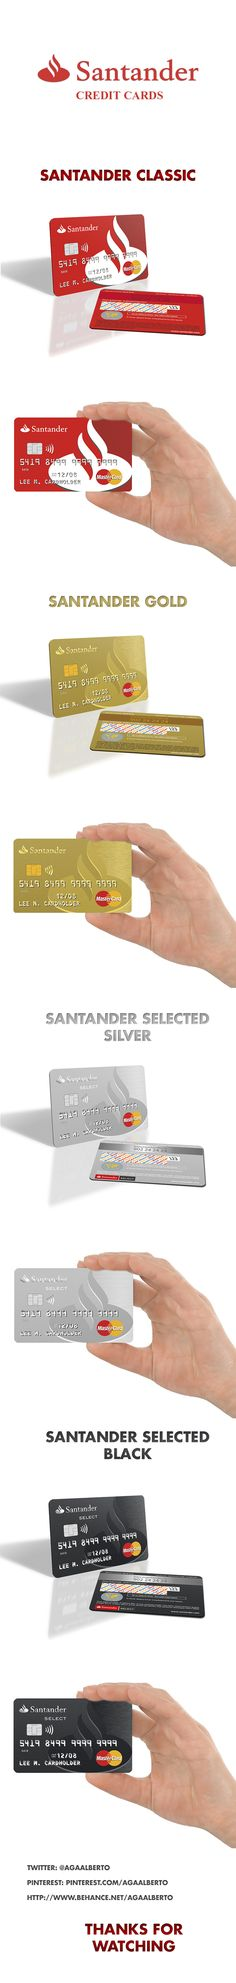 Credit card creditcardz pinterest santander credits cards credit cardsusb reheart Choice Image